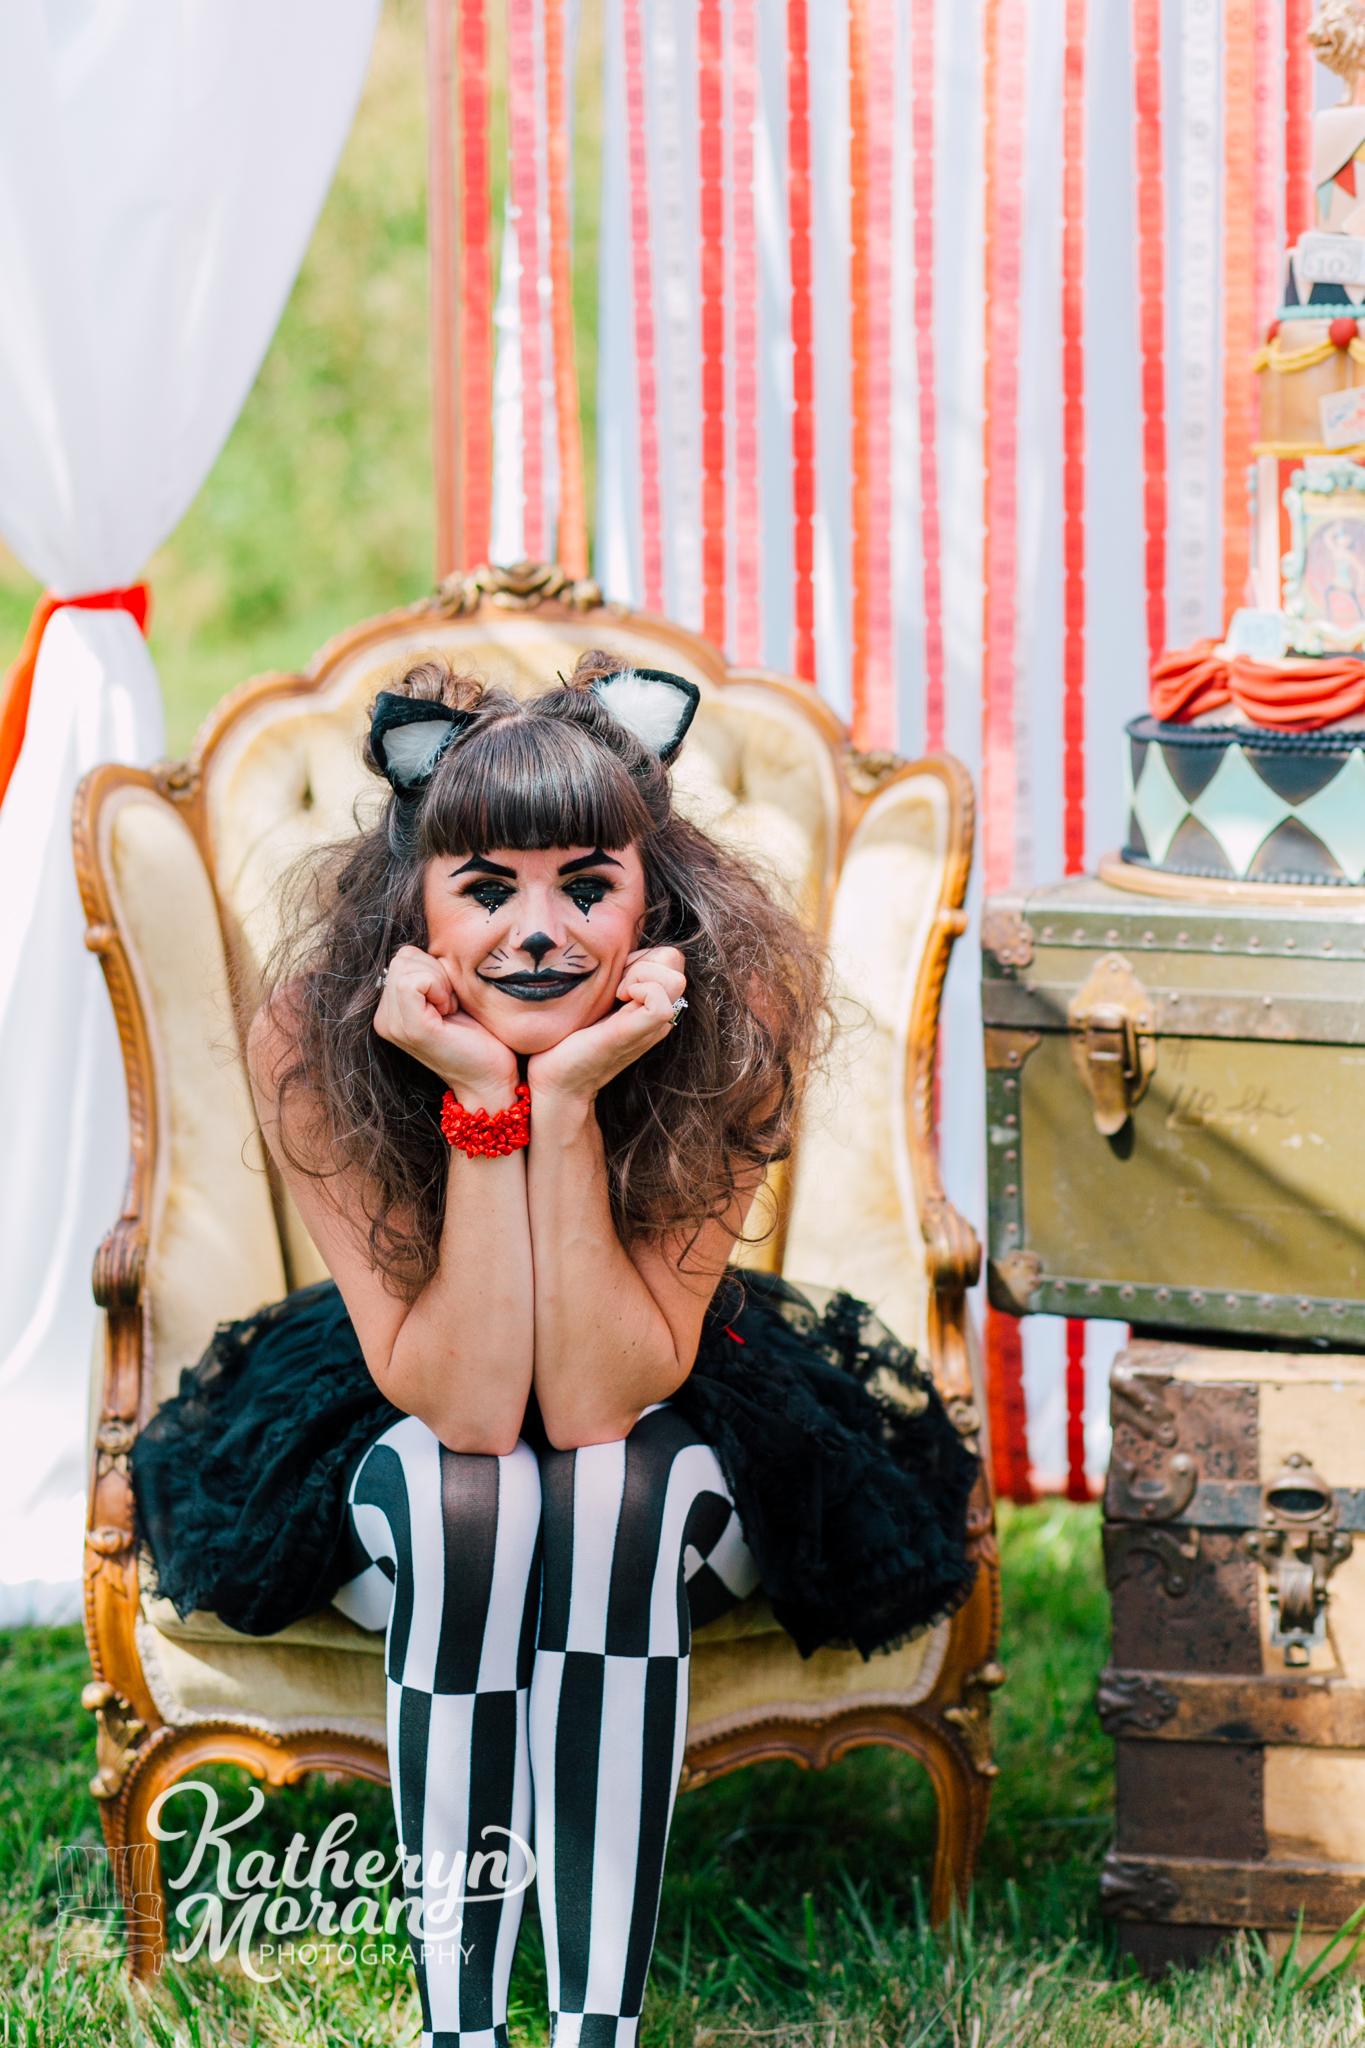 bellingham-seattle-event-photographer-vintage-circus-styled-katheryn-moran-154.jpg